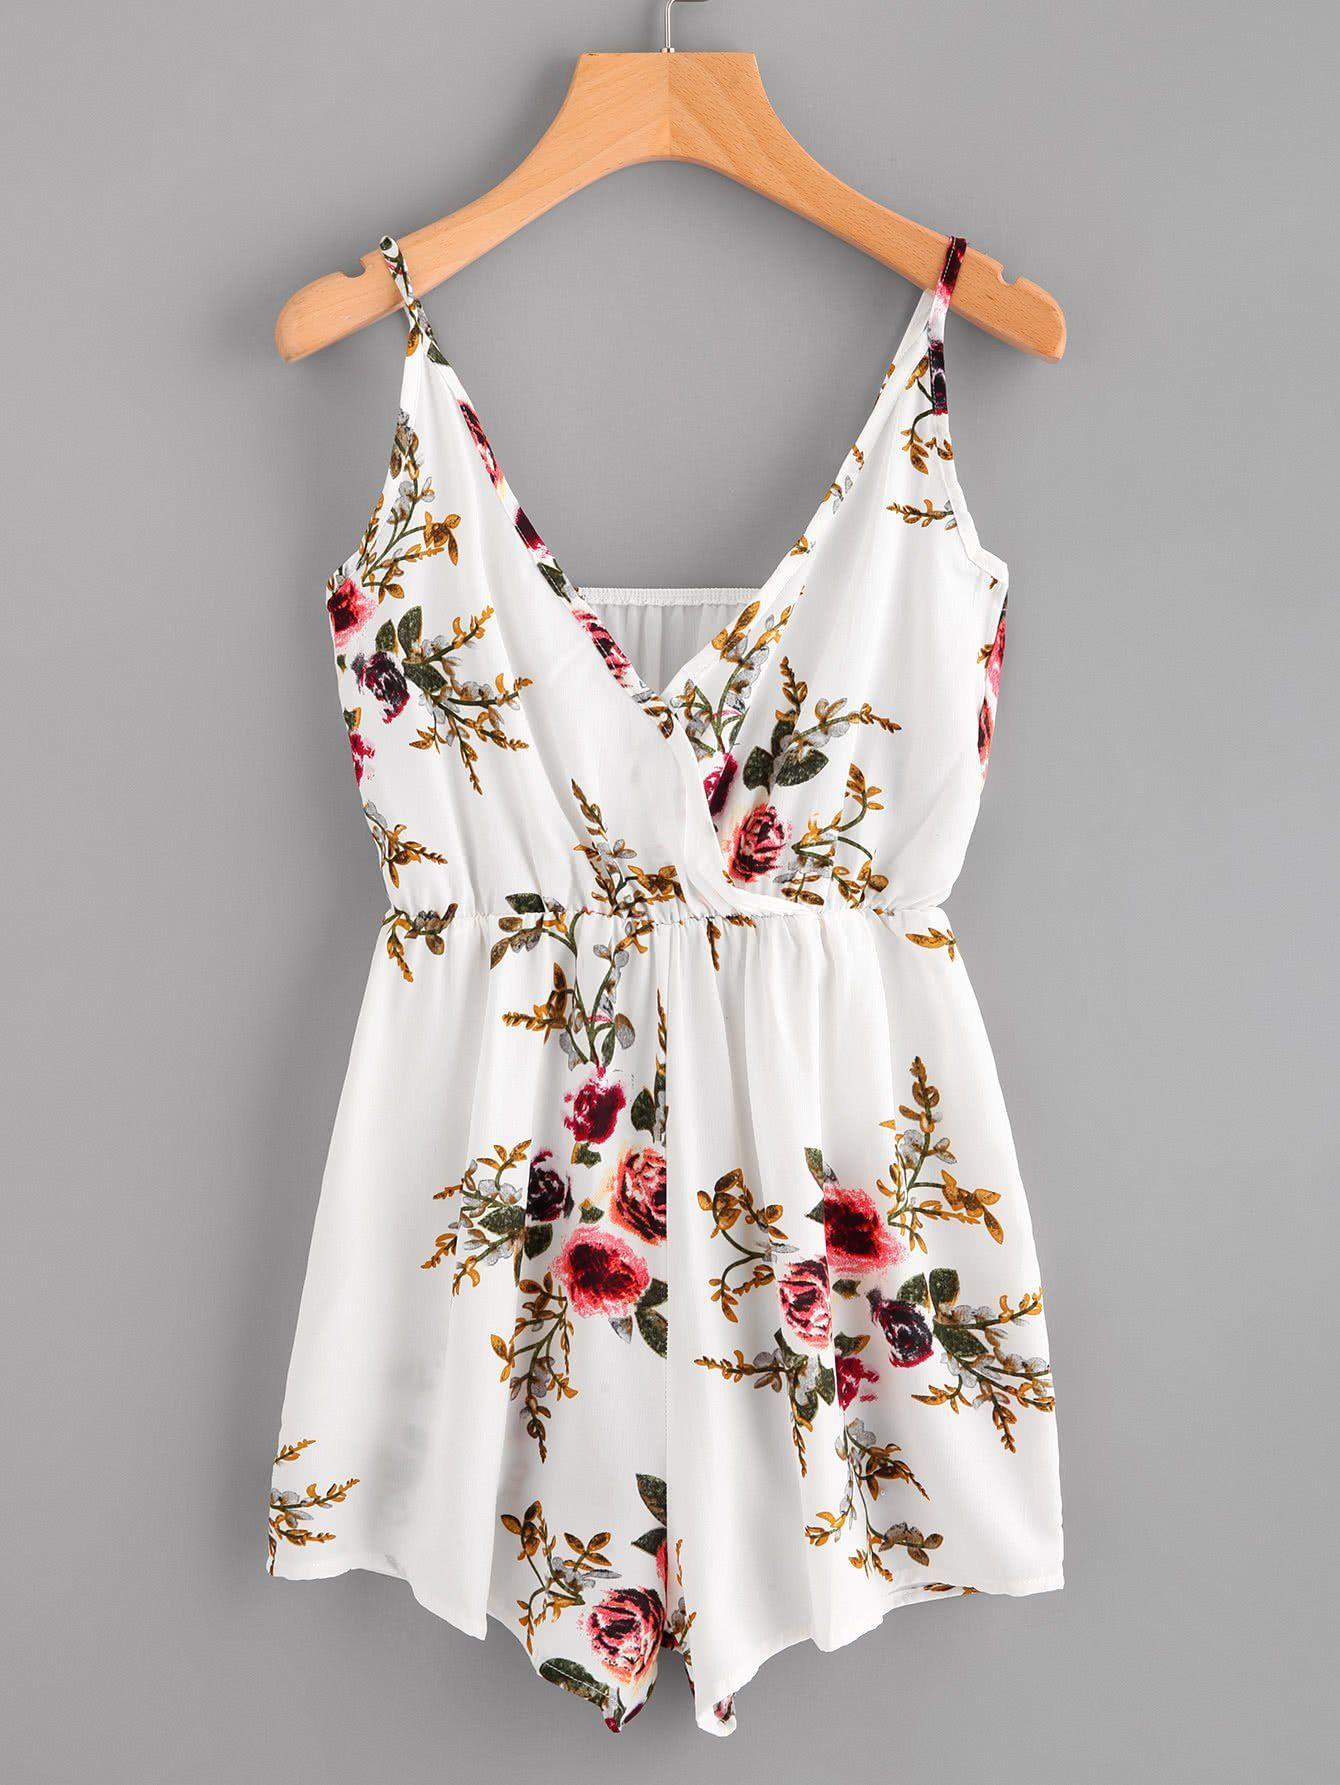 White Overall Random Floral Print Cami Straps V-Neck Sleeveless ... 61ea88fc653